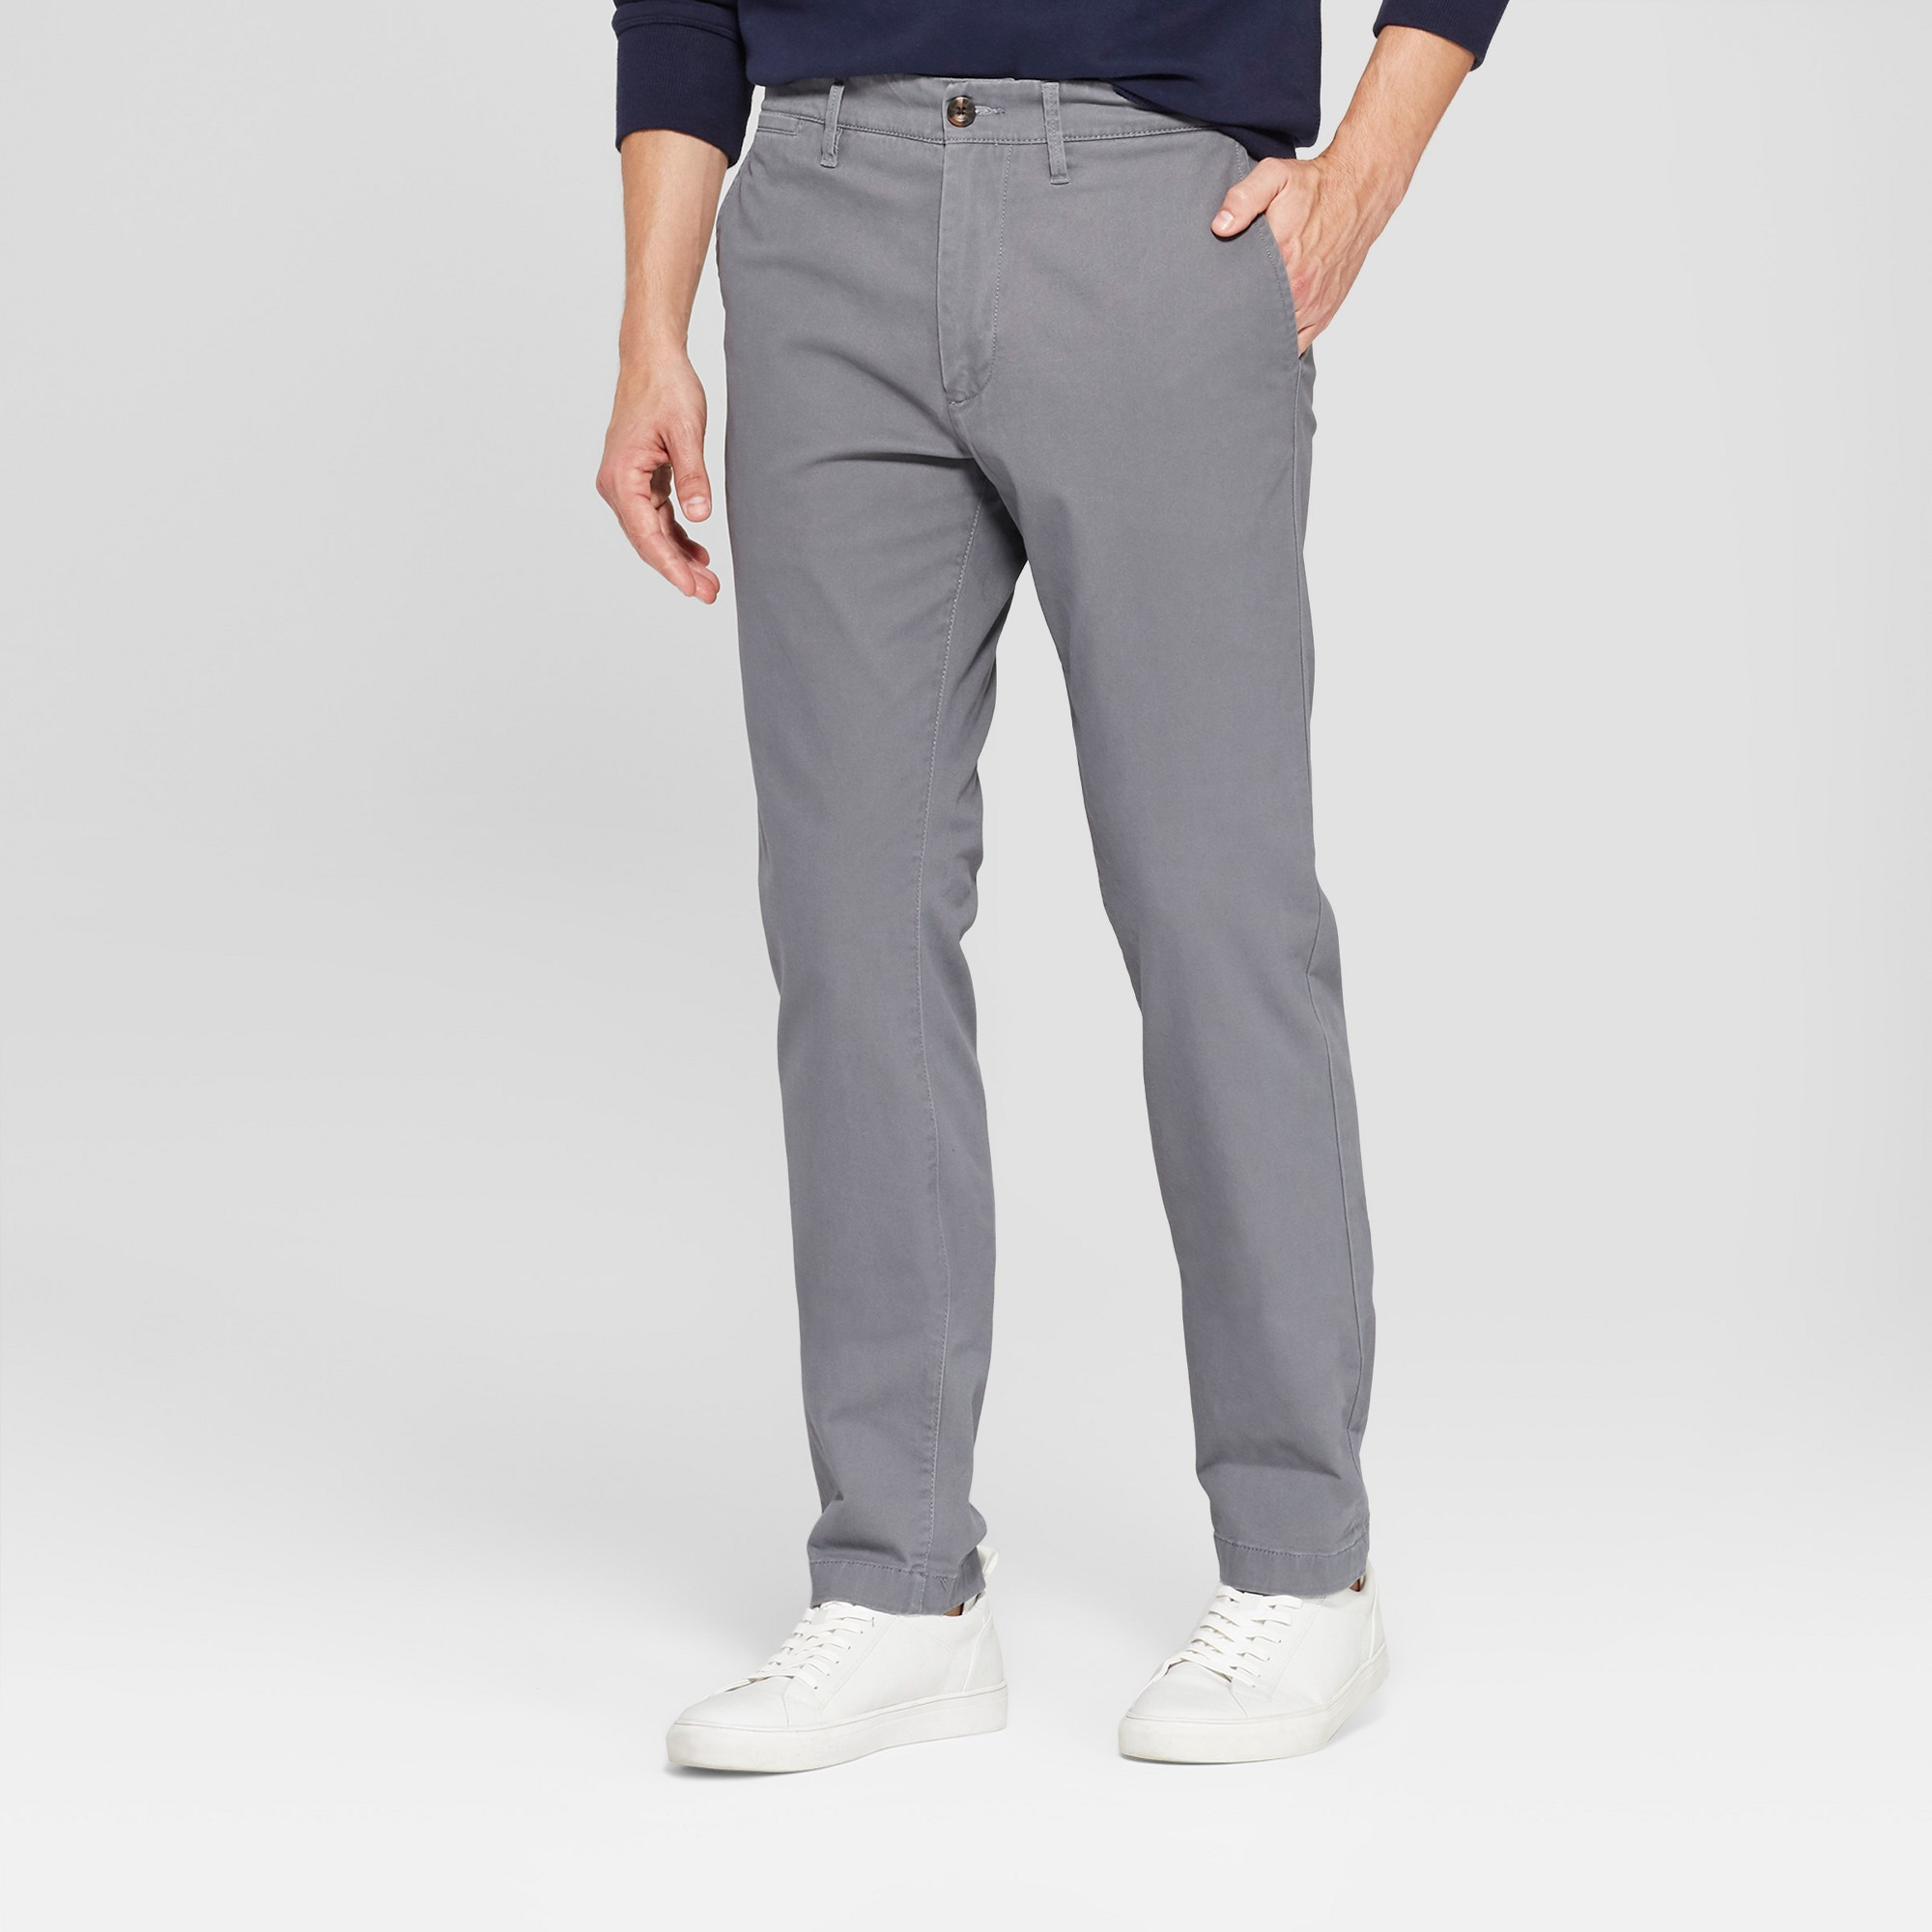 Men's Slim Fit Hennepin Chino - Goodfellow & Co Dark Gray 36x30